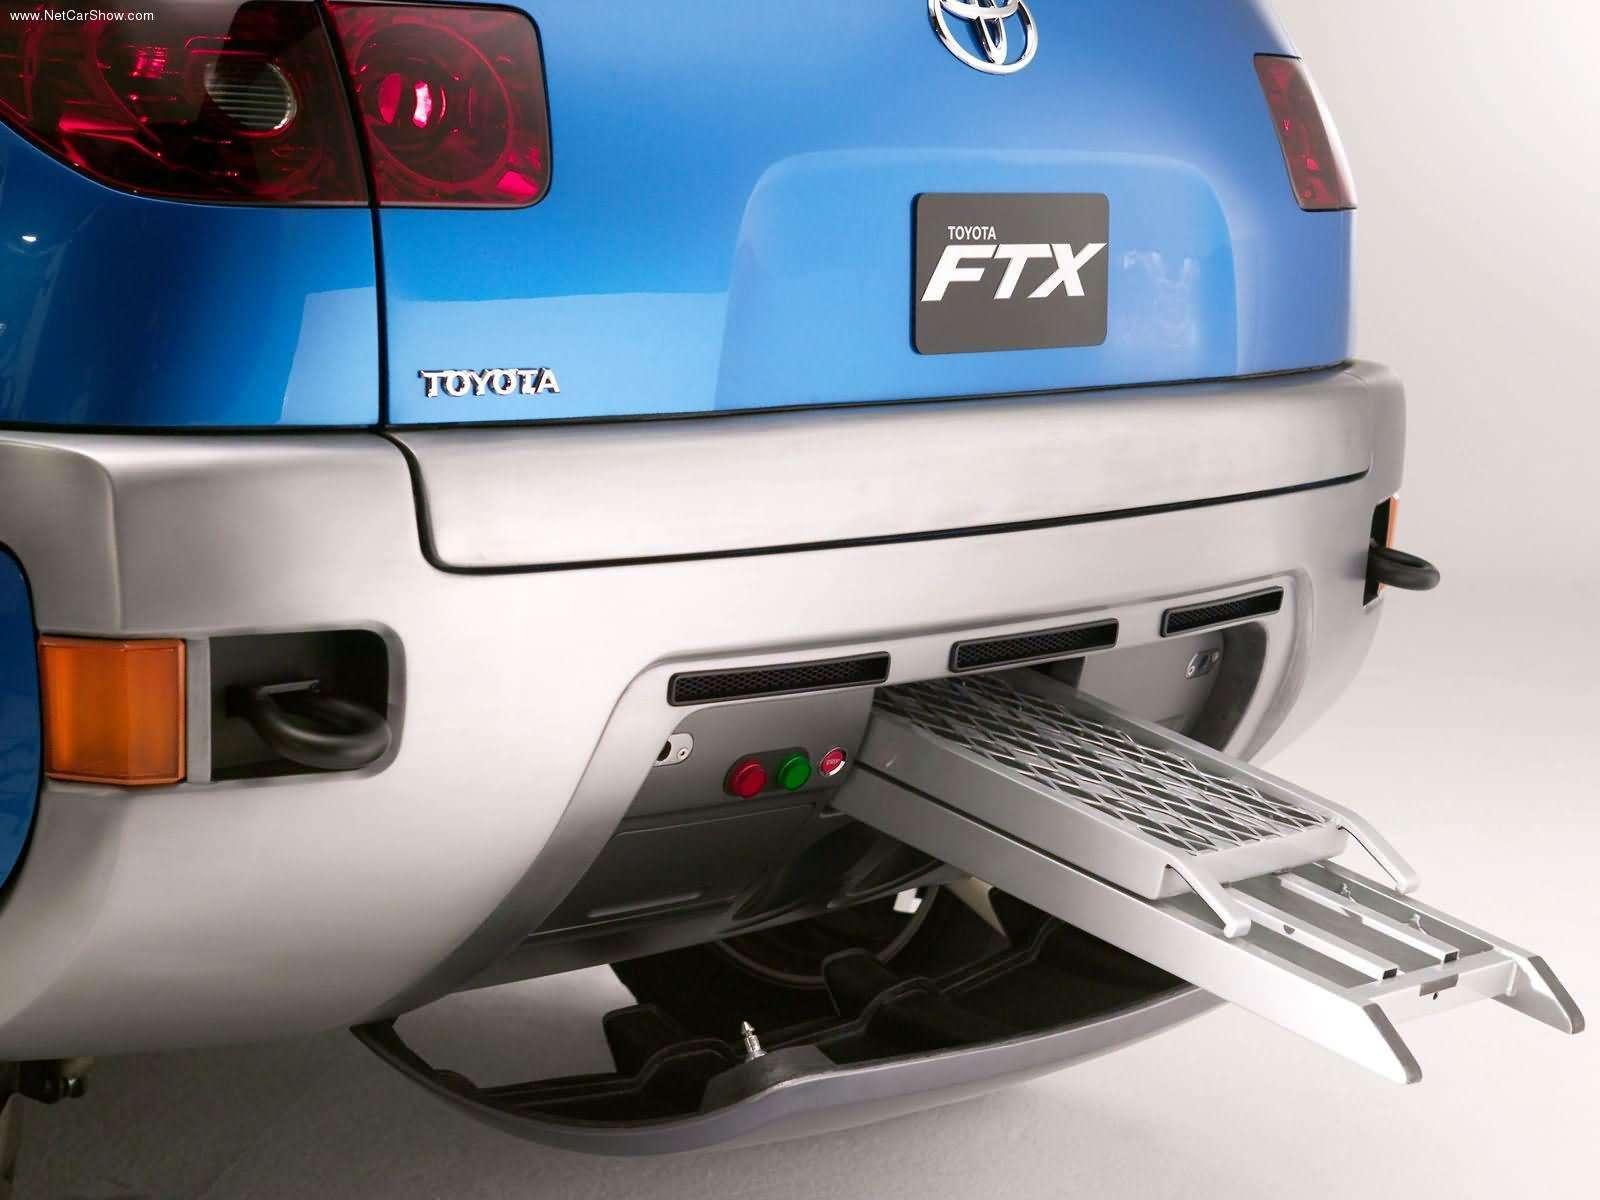 Toyota-FTX_Concept_2004_1600x1200_wallpaper_21.jpg